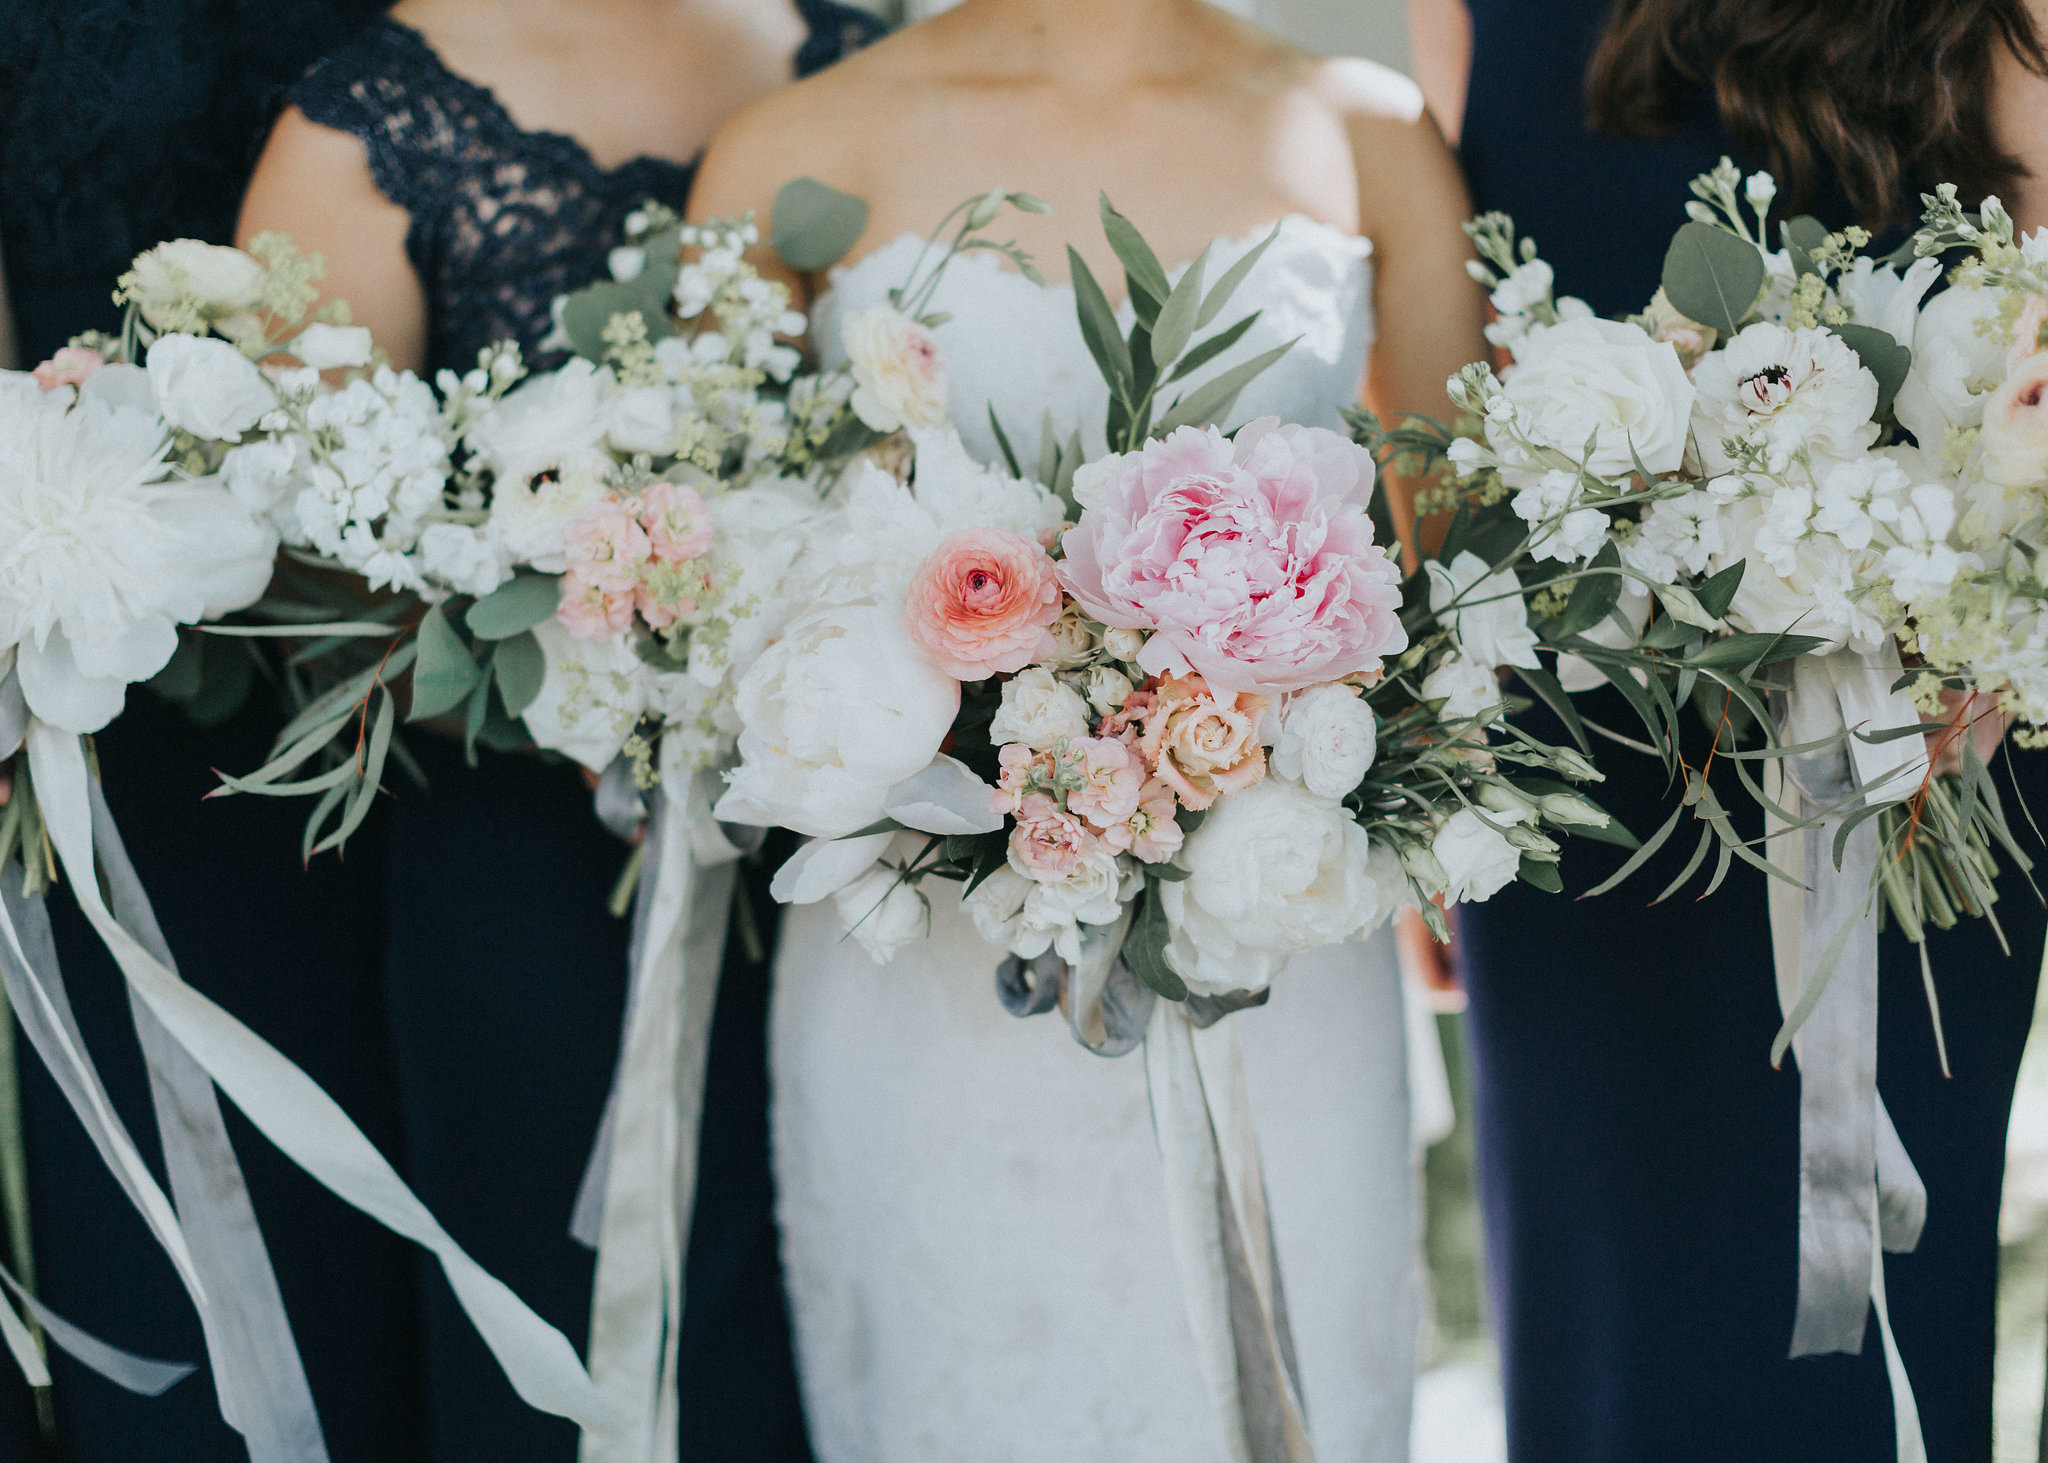 Melissa_Jason_Nonantum_Wedding_Portraits-147.jpg